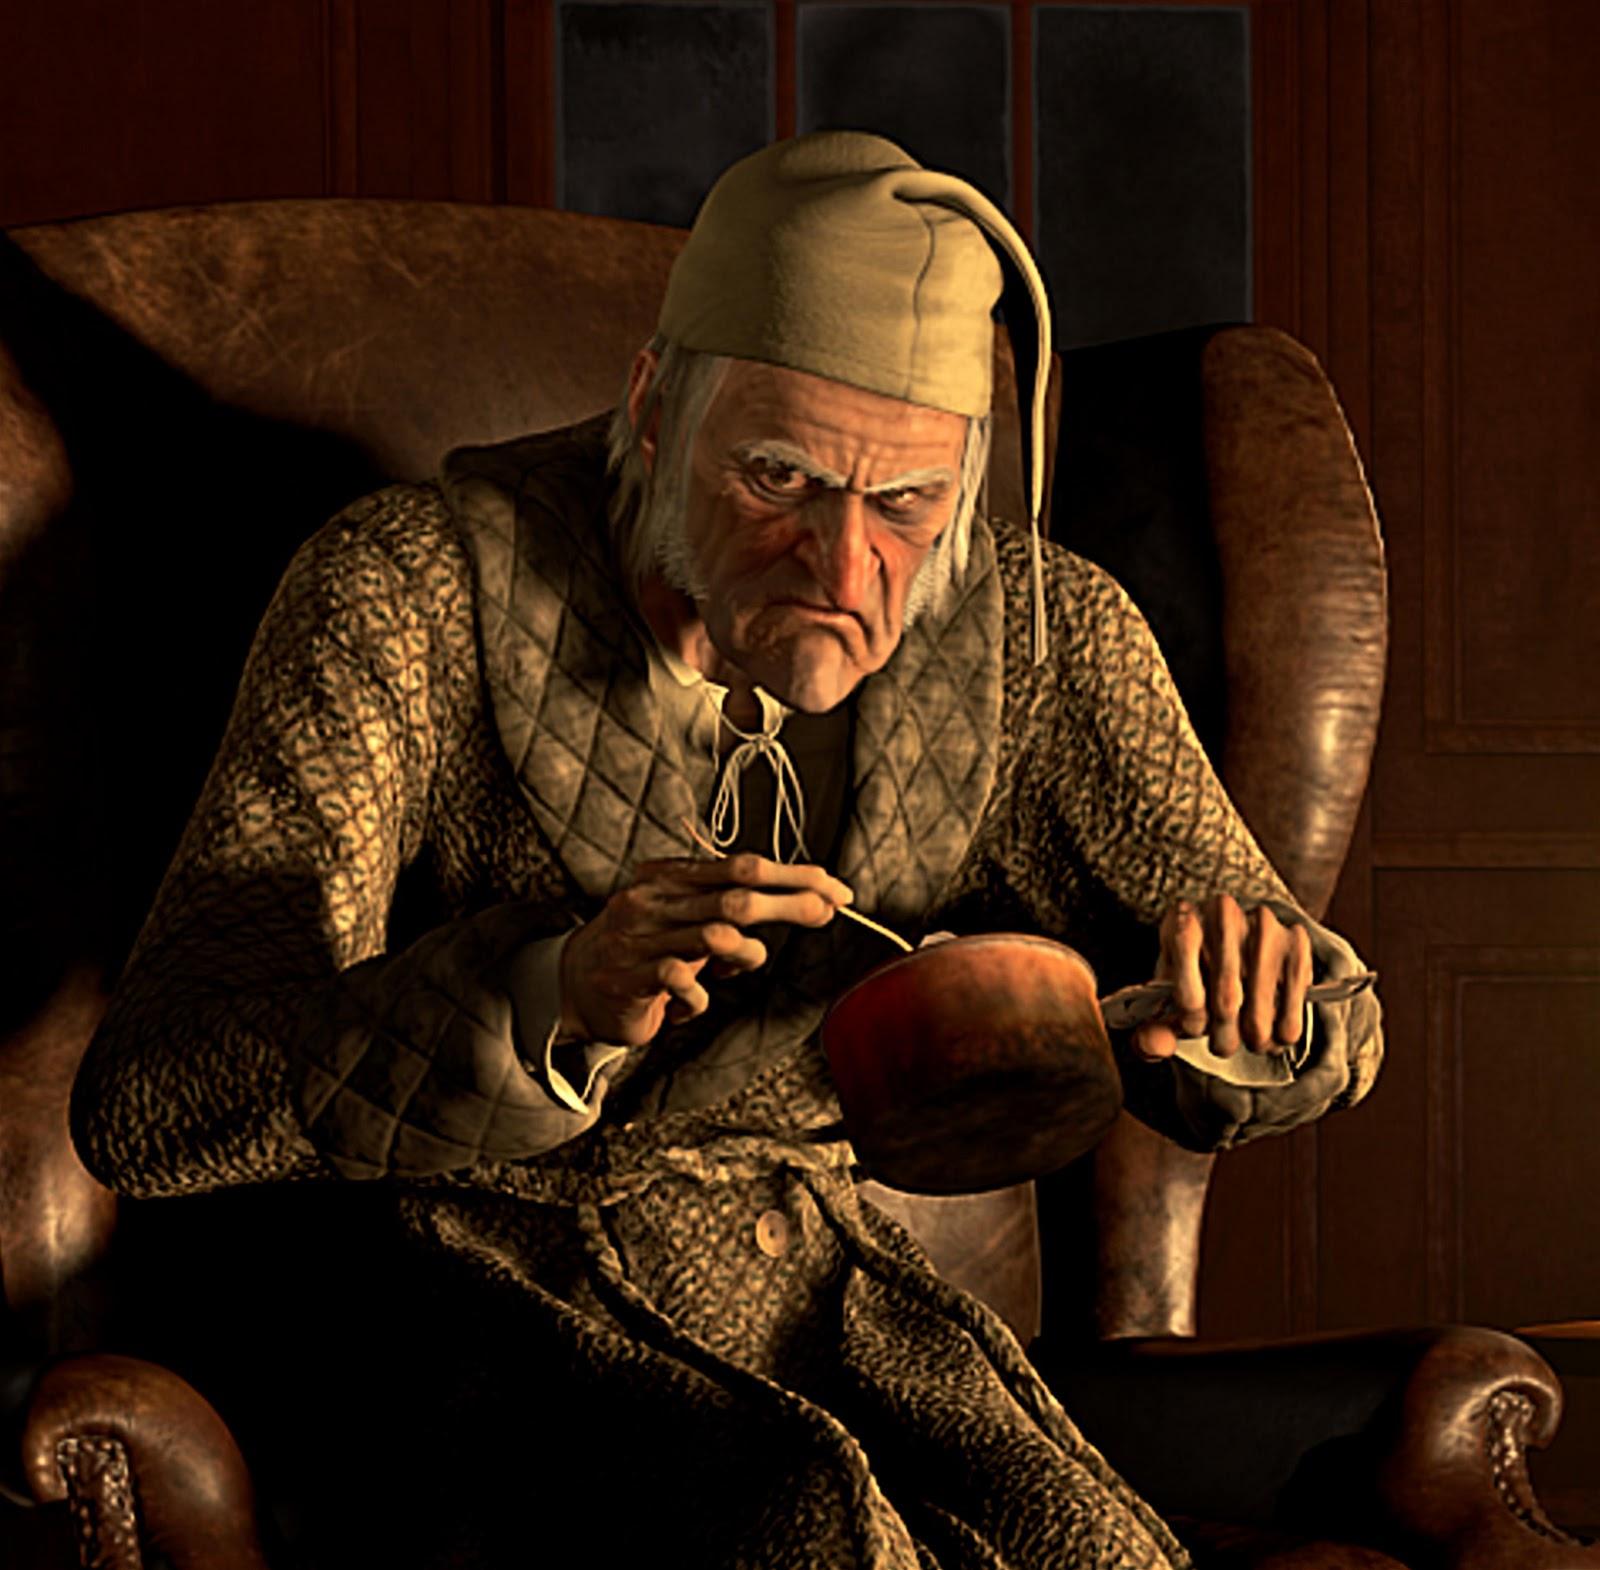 image of ebenezer scrooge in 2009 disneys a christmas carol - Classic Christmas Stories